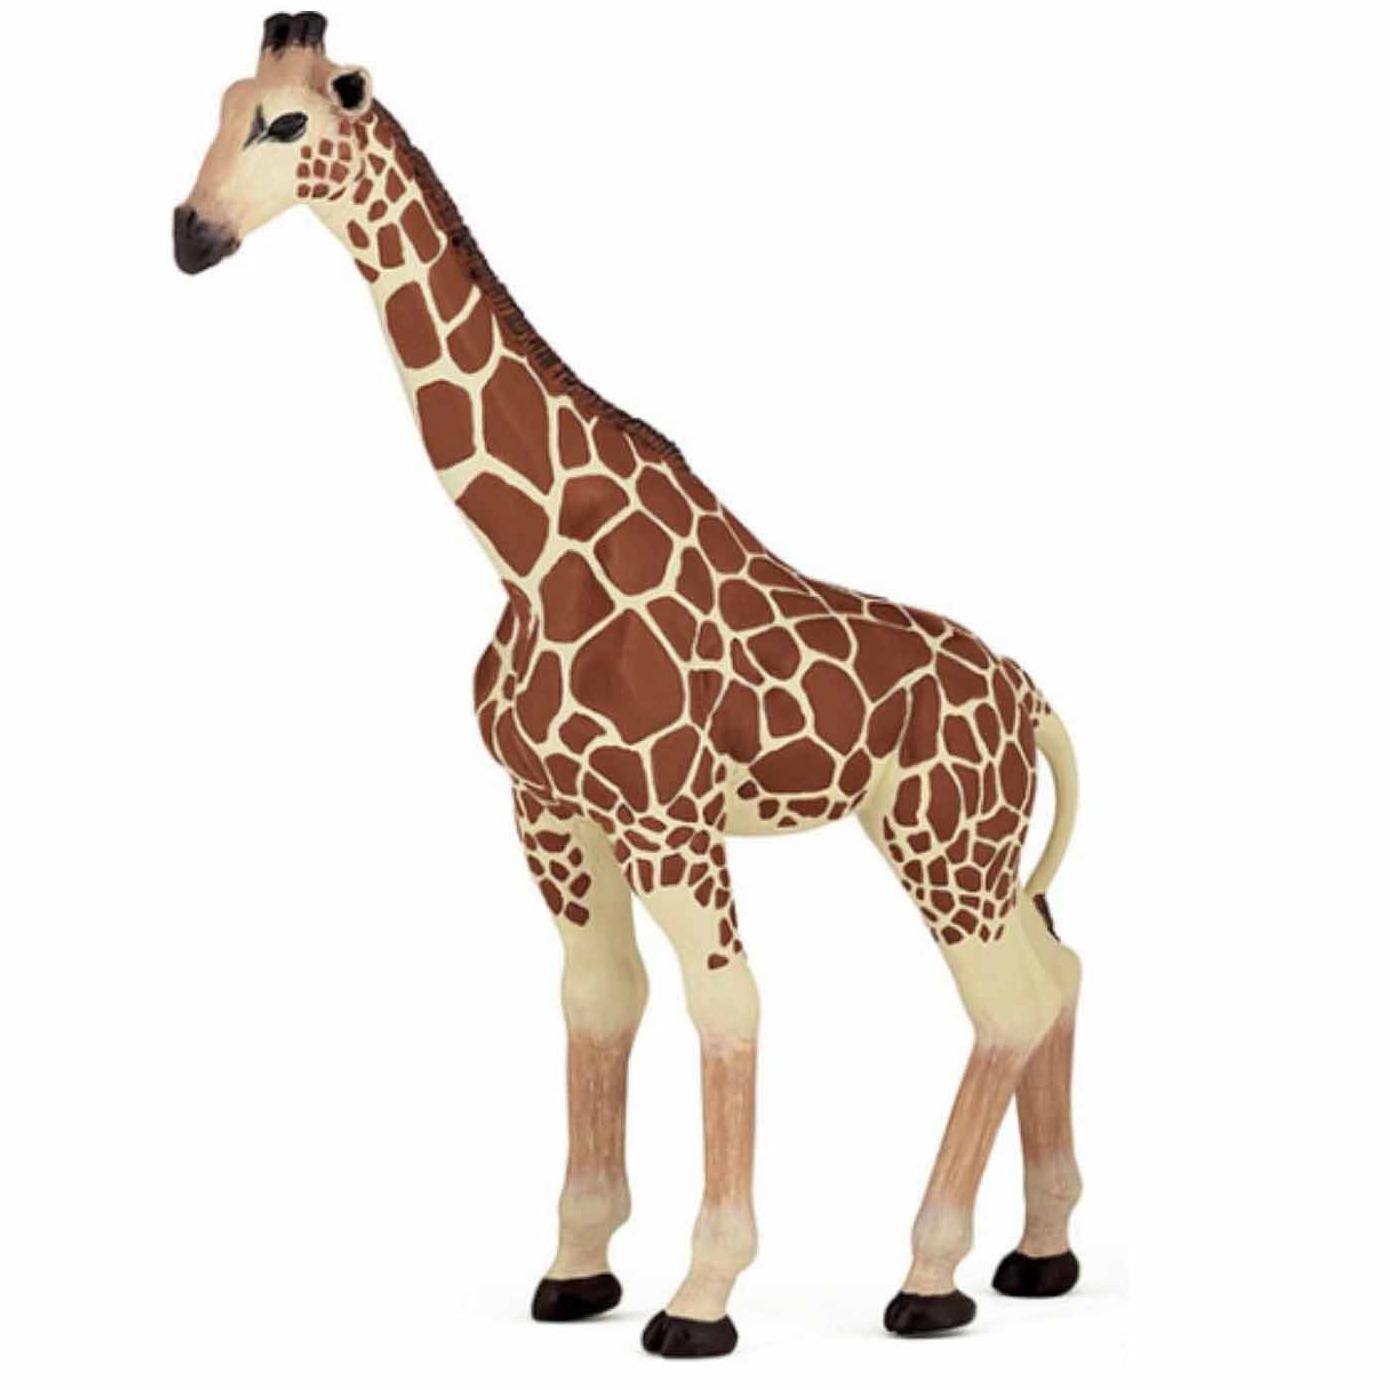 Safarie dieren speelgoed giraffe